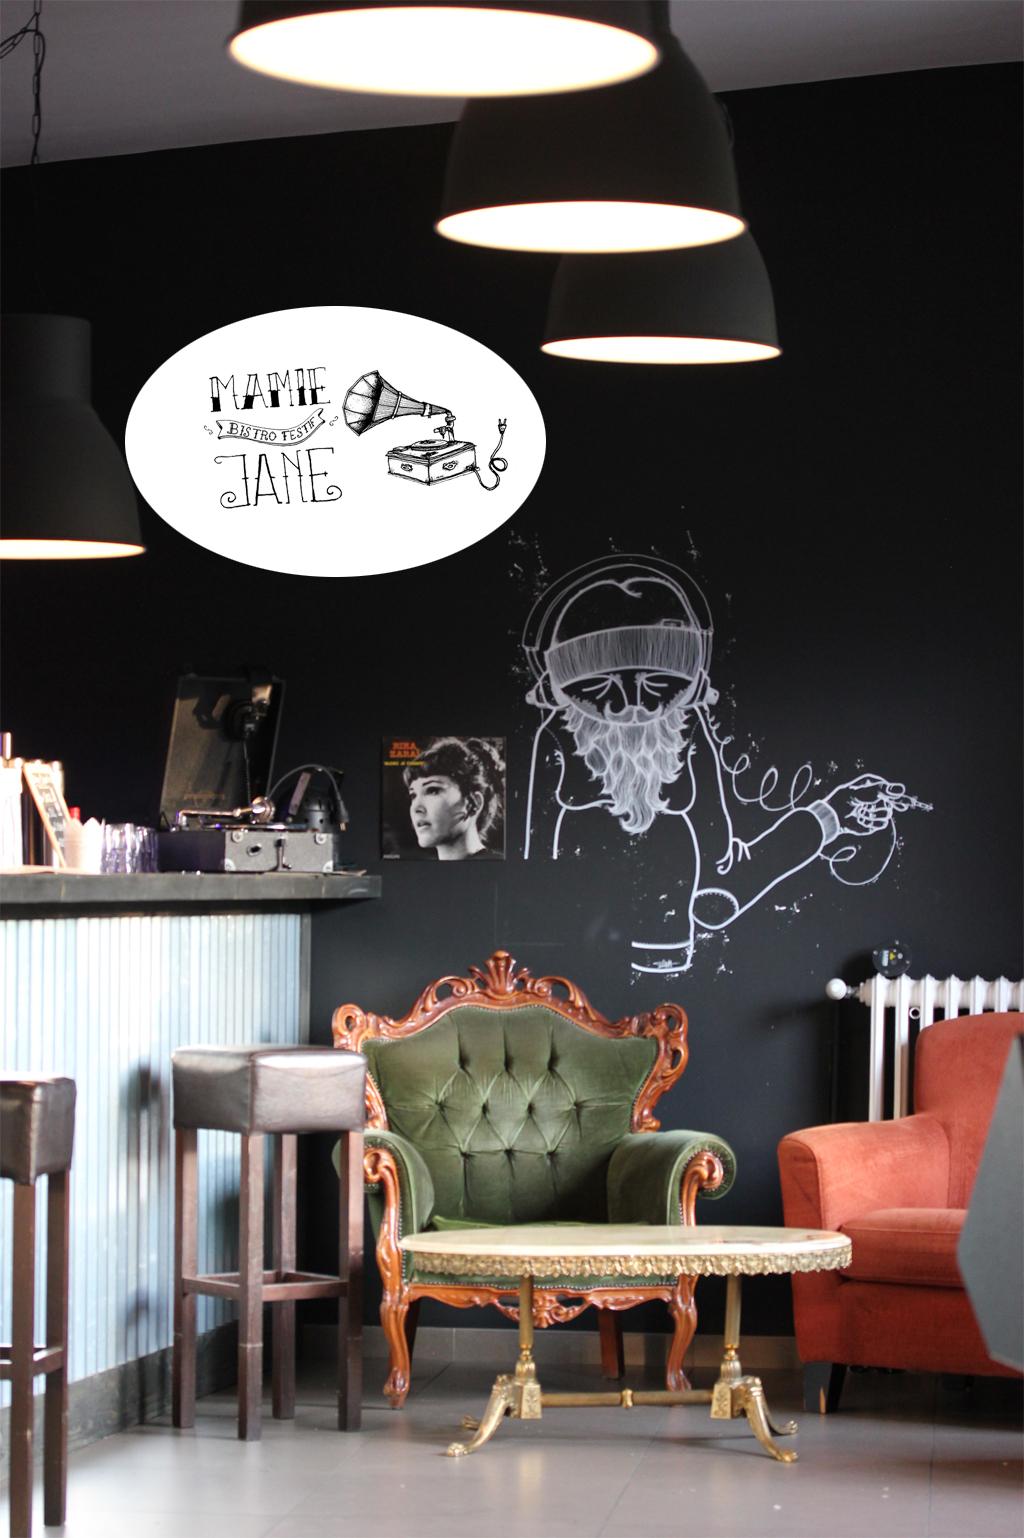 Insolite-Mamie_Jane-Aix_Les_Bains-Hotel-Restaurant-Bar-Arty-Julien_Lopez-Freeride-DJ